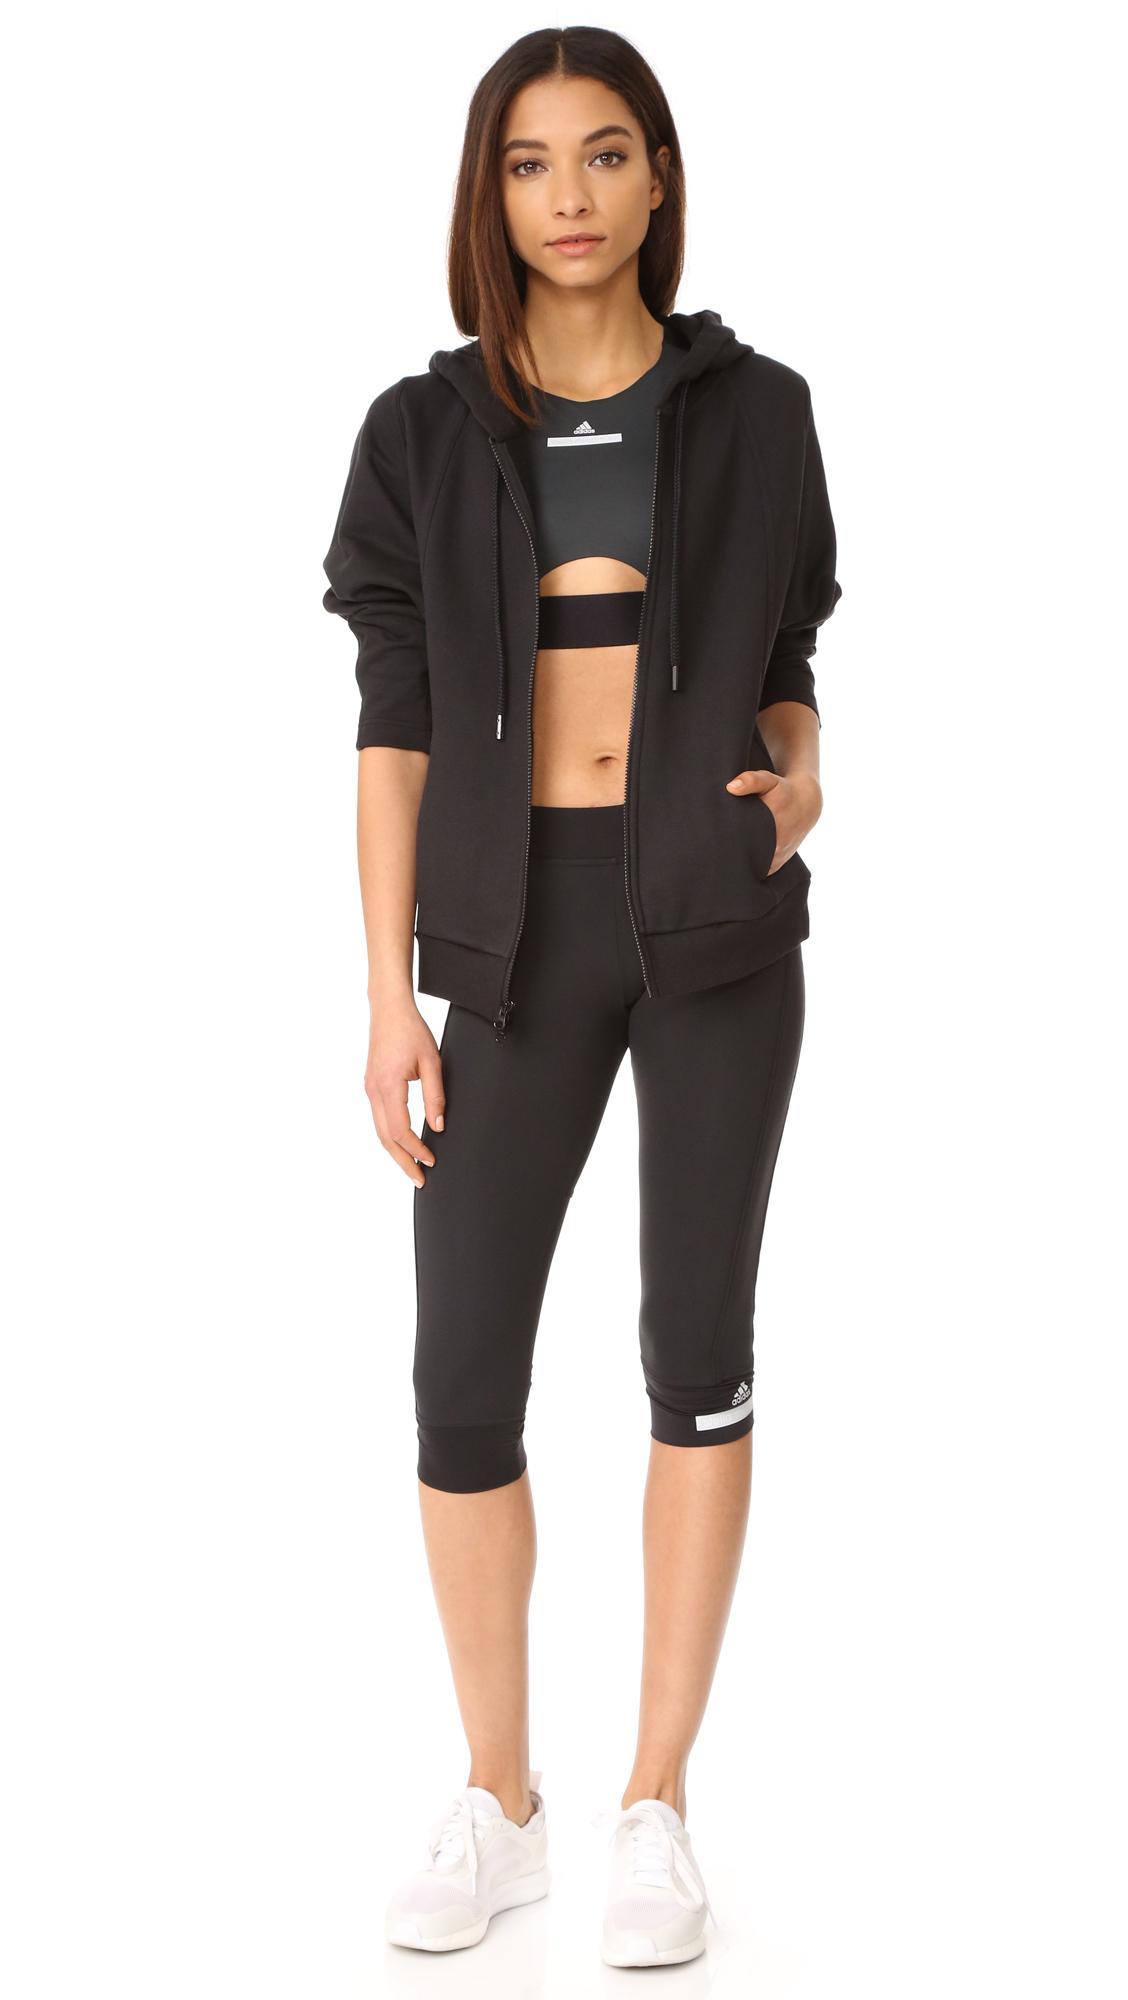 lyst adidas by stella mccartney run sports bra in black. Black Bedroom Furniture Sets. Home Design Ideas